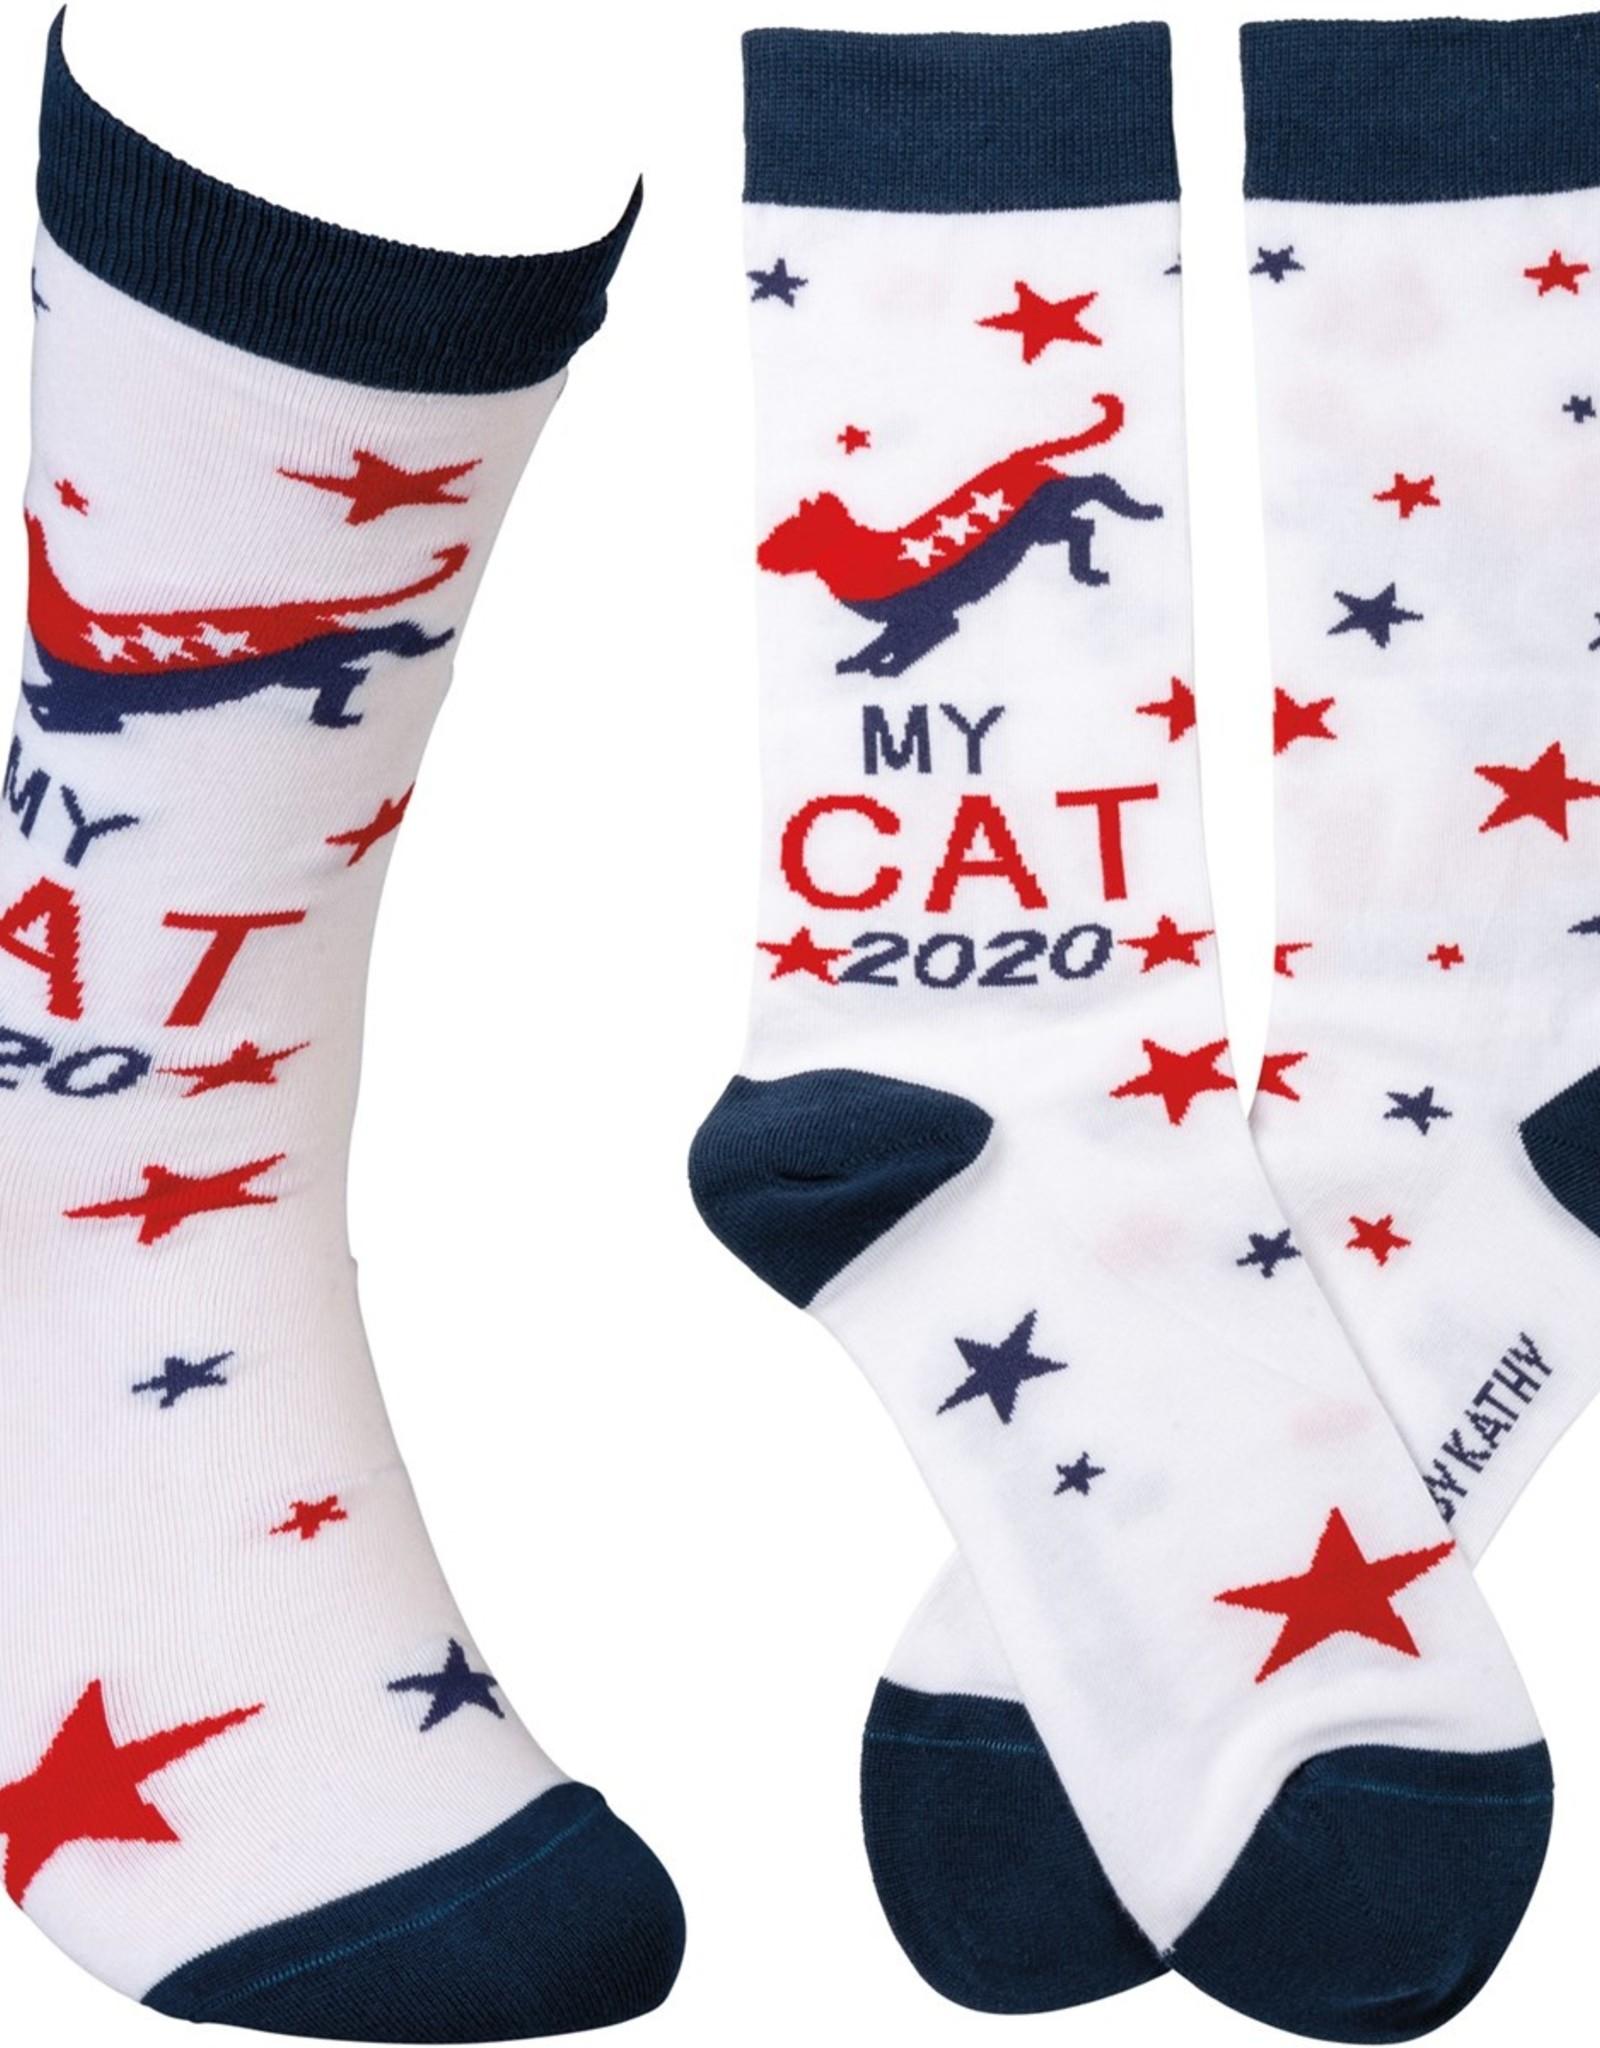 Primitives By Kathy Socks - My Cat 2020